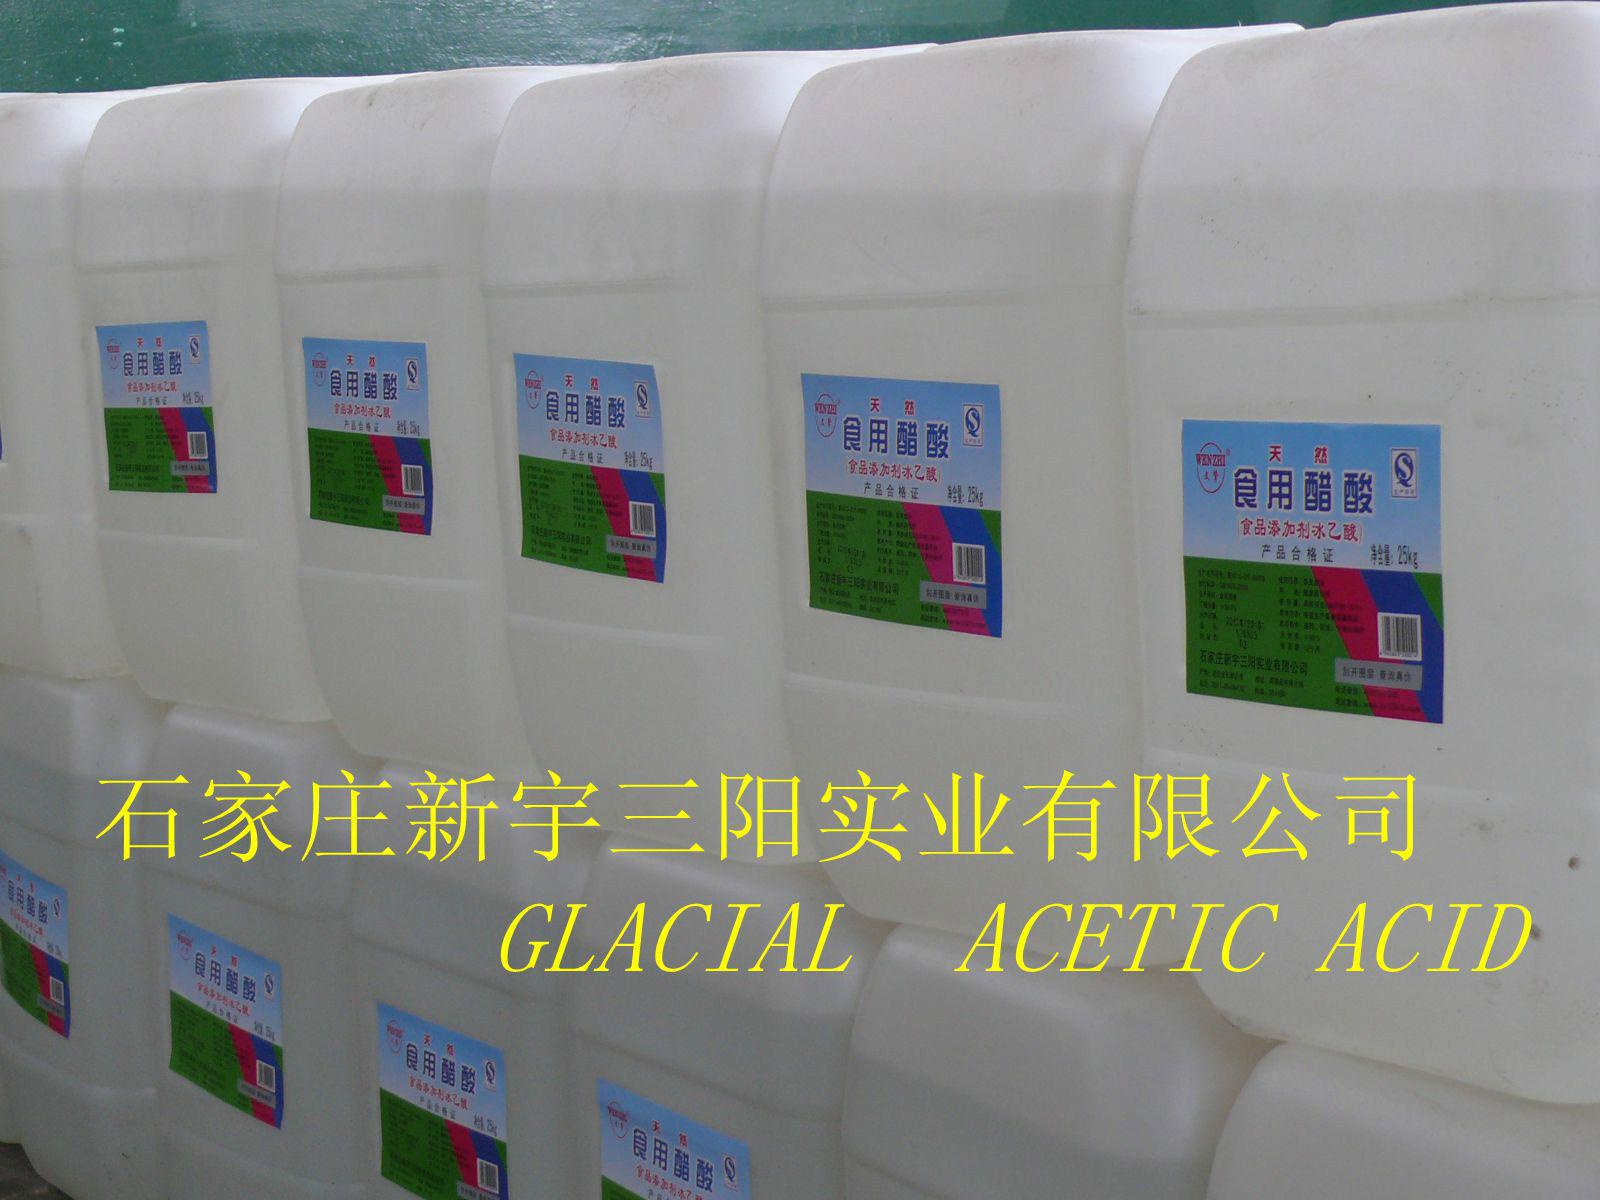 acetic acid 99.5%